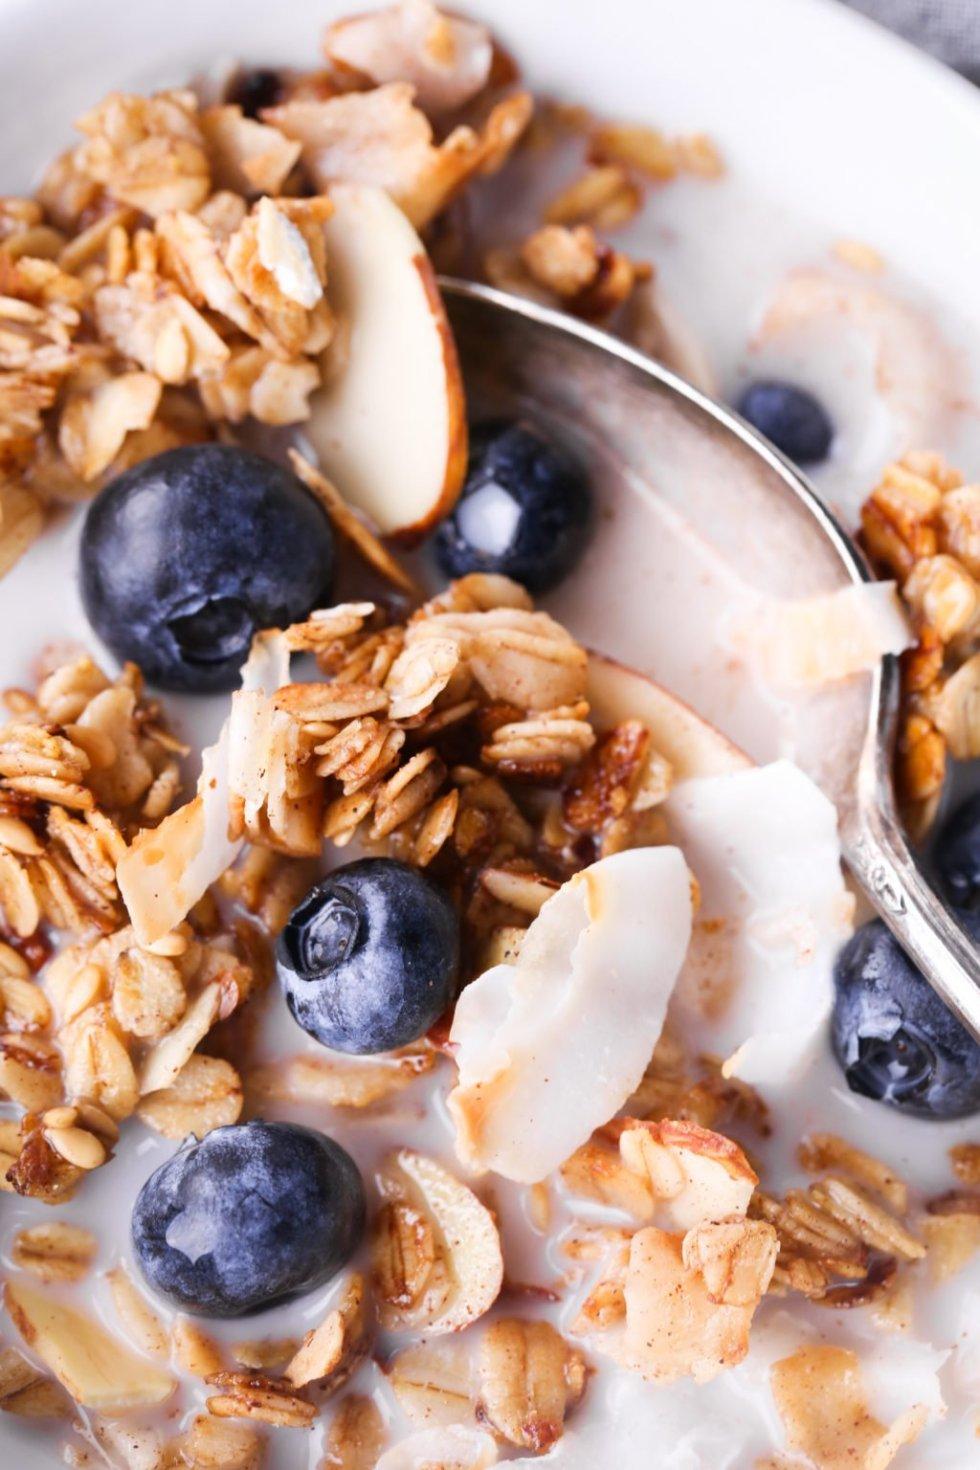 5-Minute Skillet Granola | Gluten, dairy, and refined sugar free.